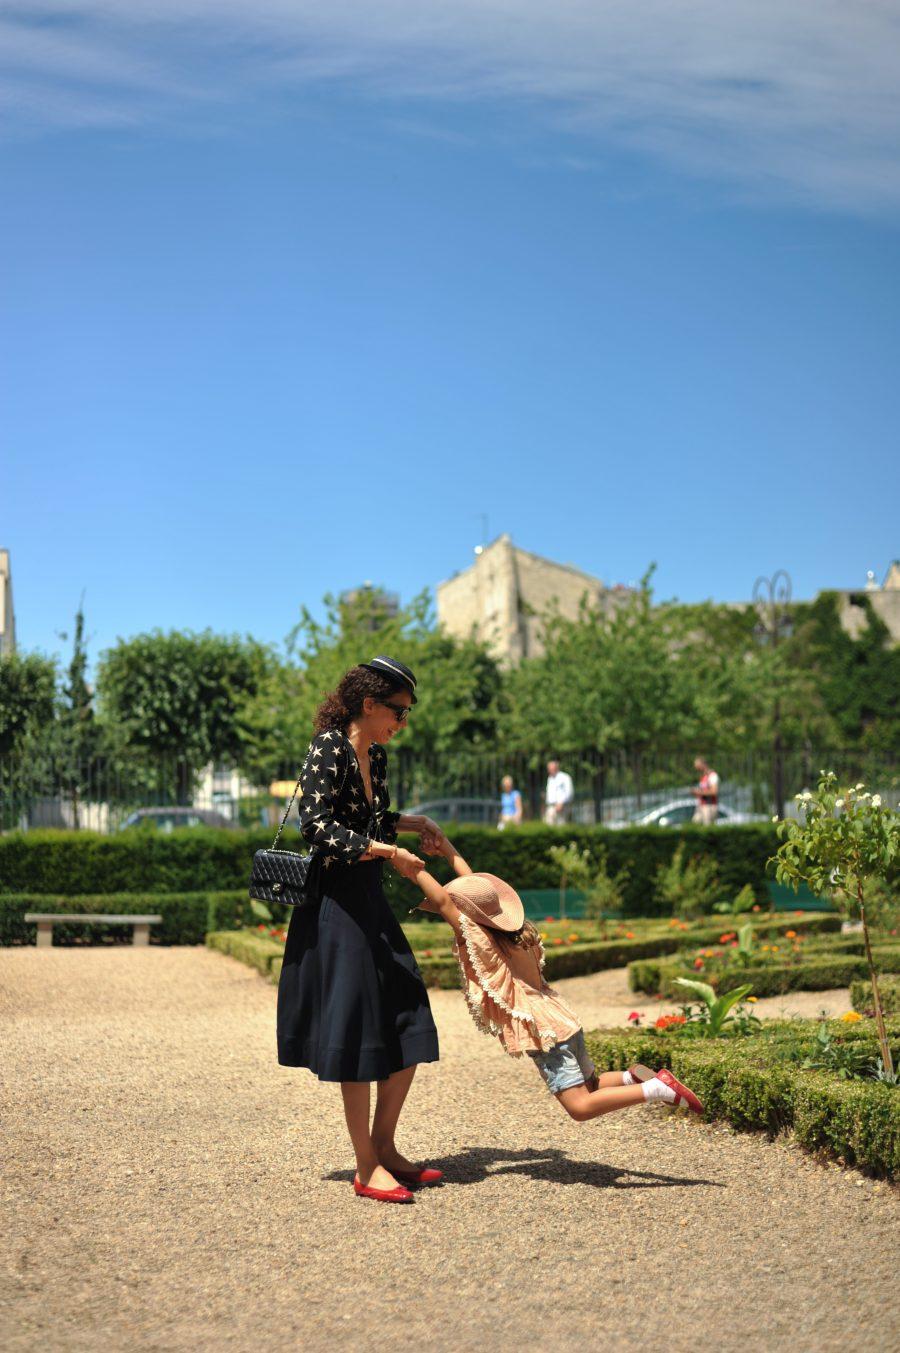 jupe-midi-parisienne-cheminsblancs-10